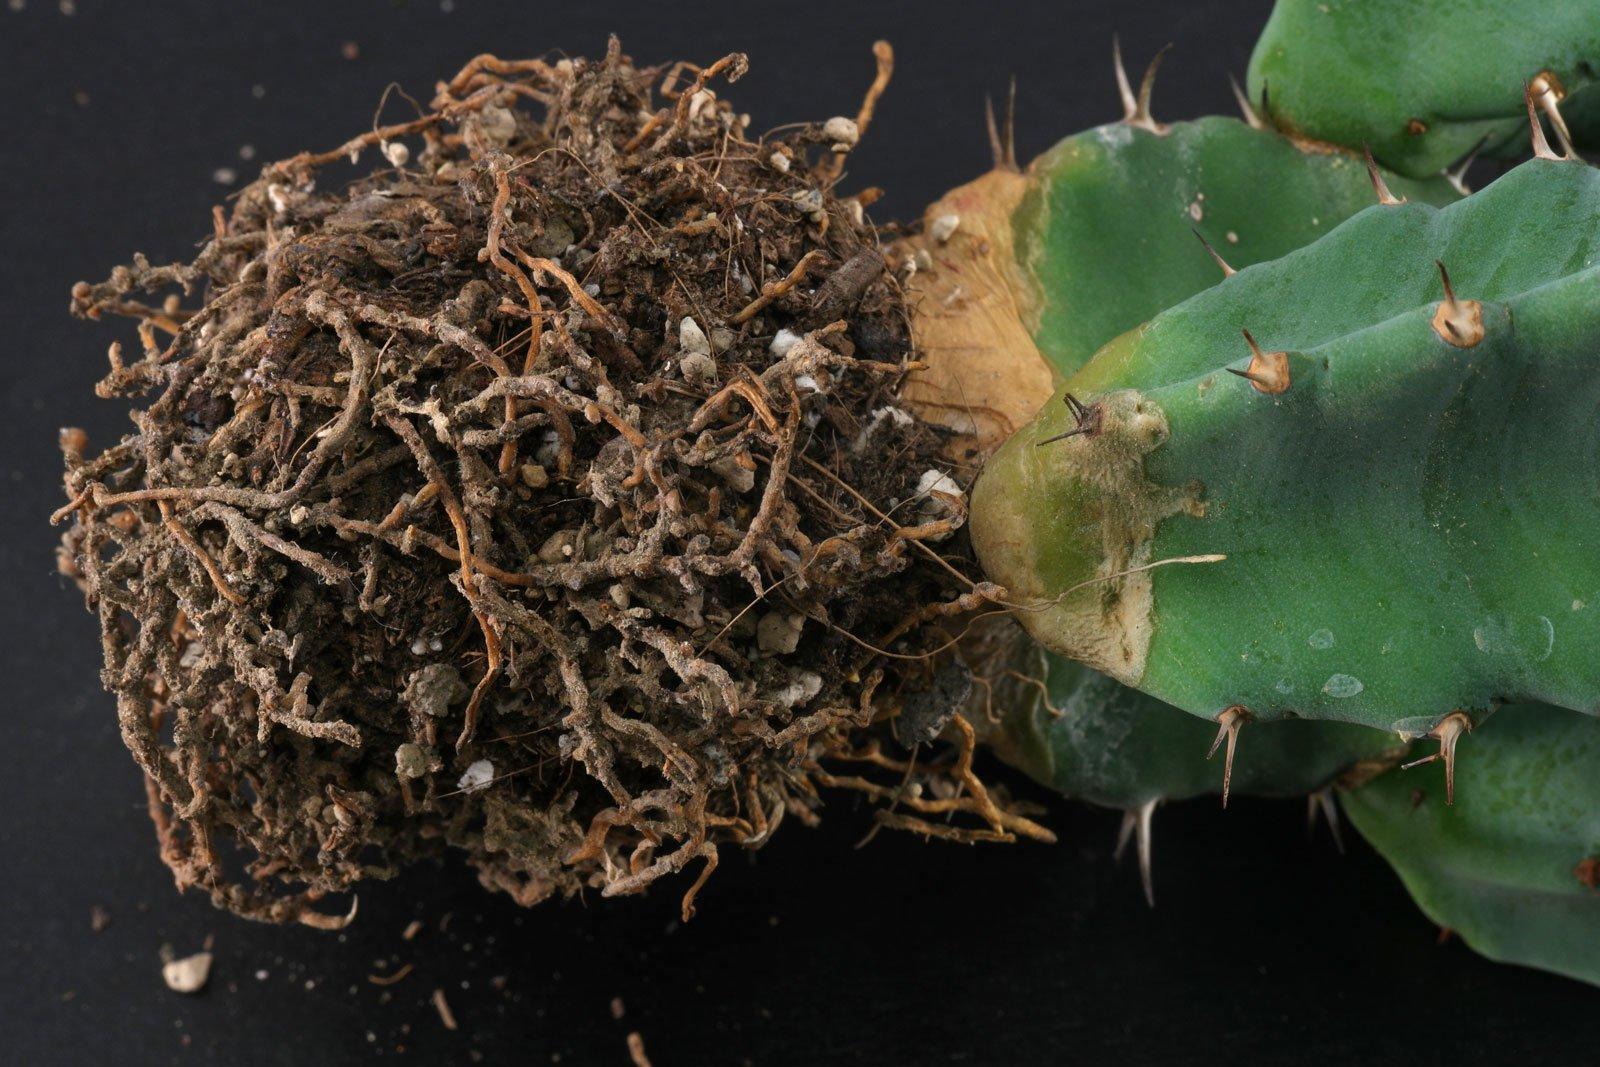 Euphorbia resinifera roots